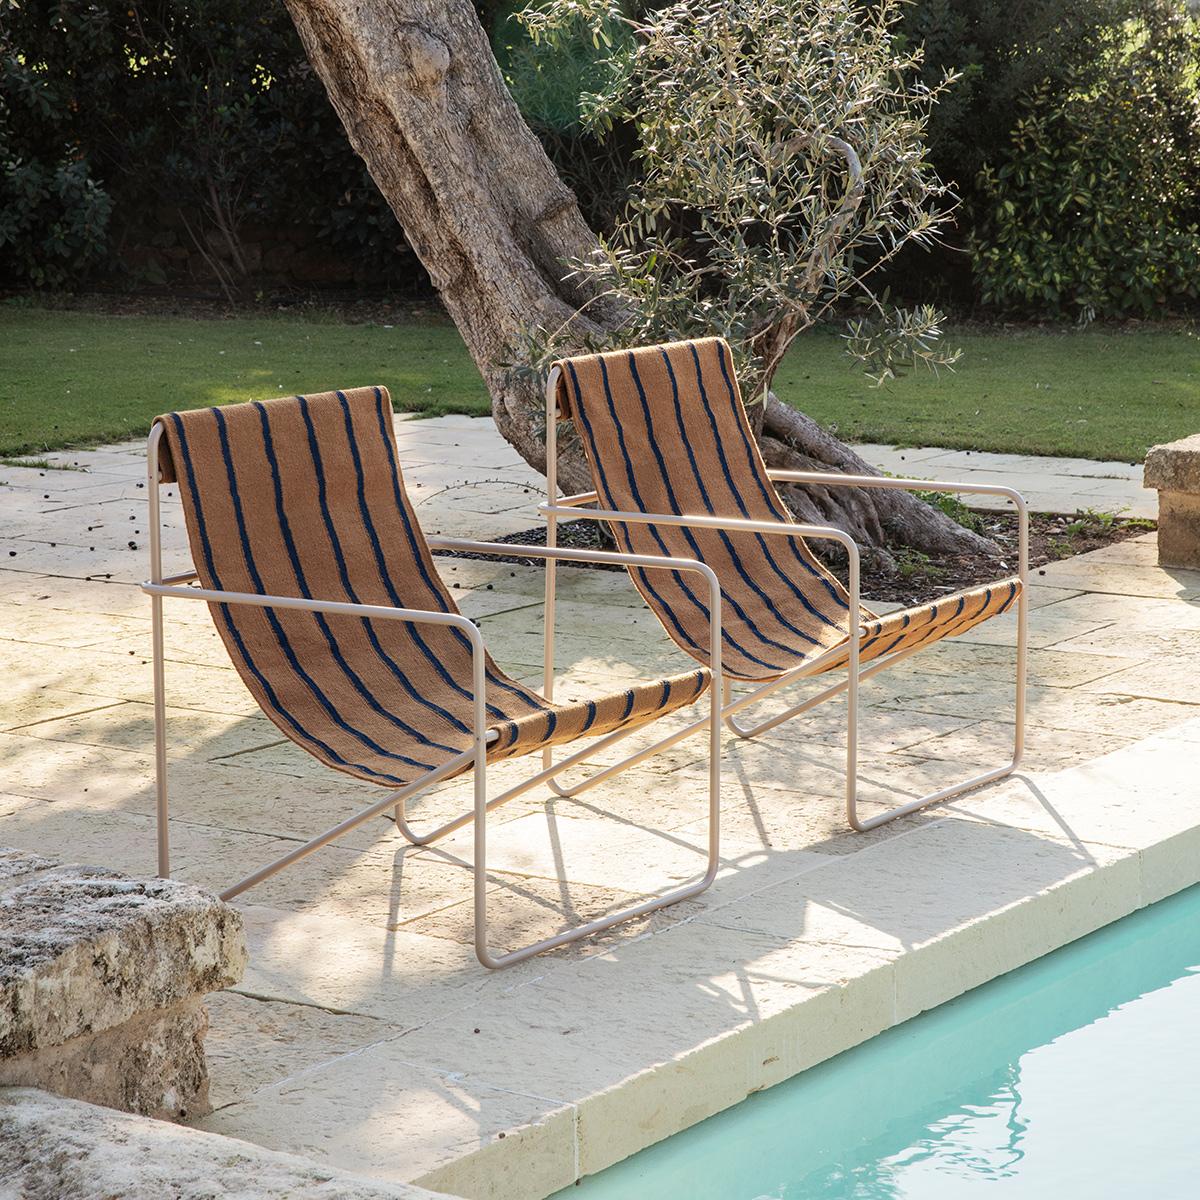 ferm-living_desert-lounge-chair-cashmere-stripes_3_resort-conceptstore